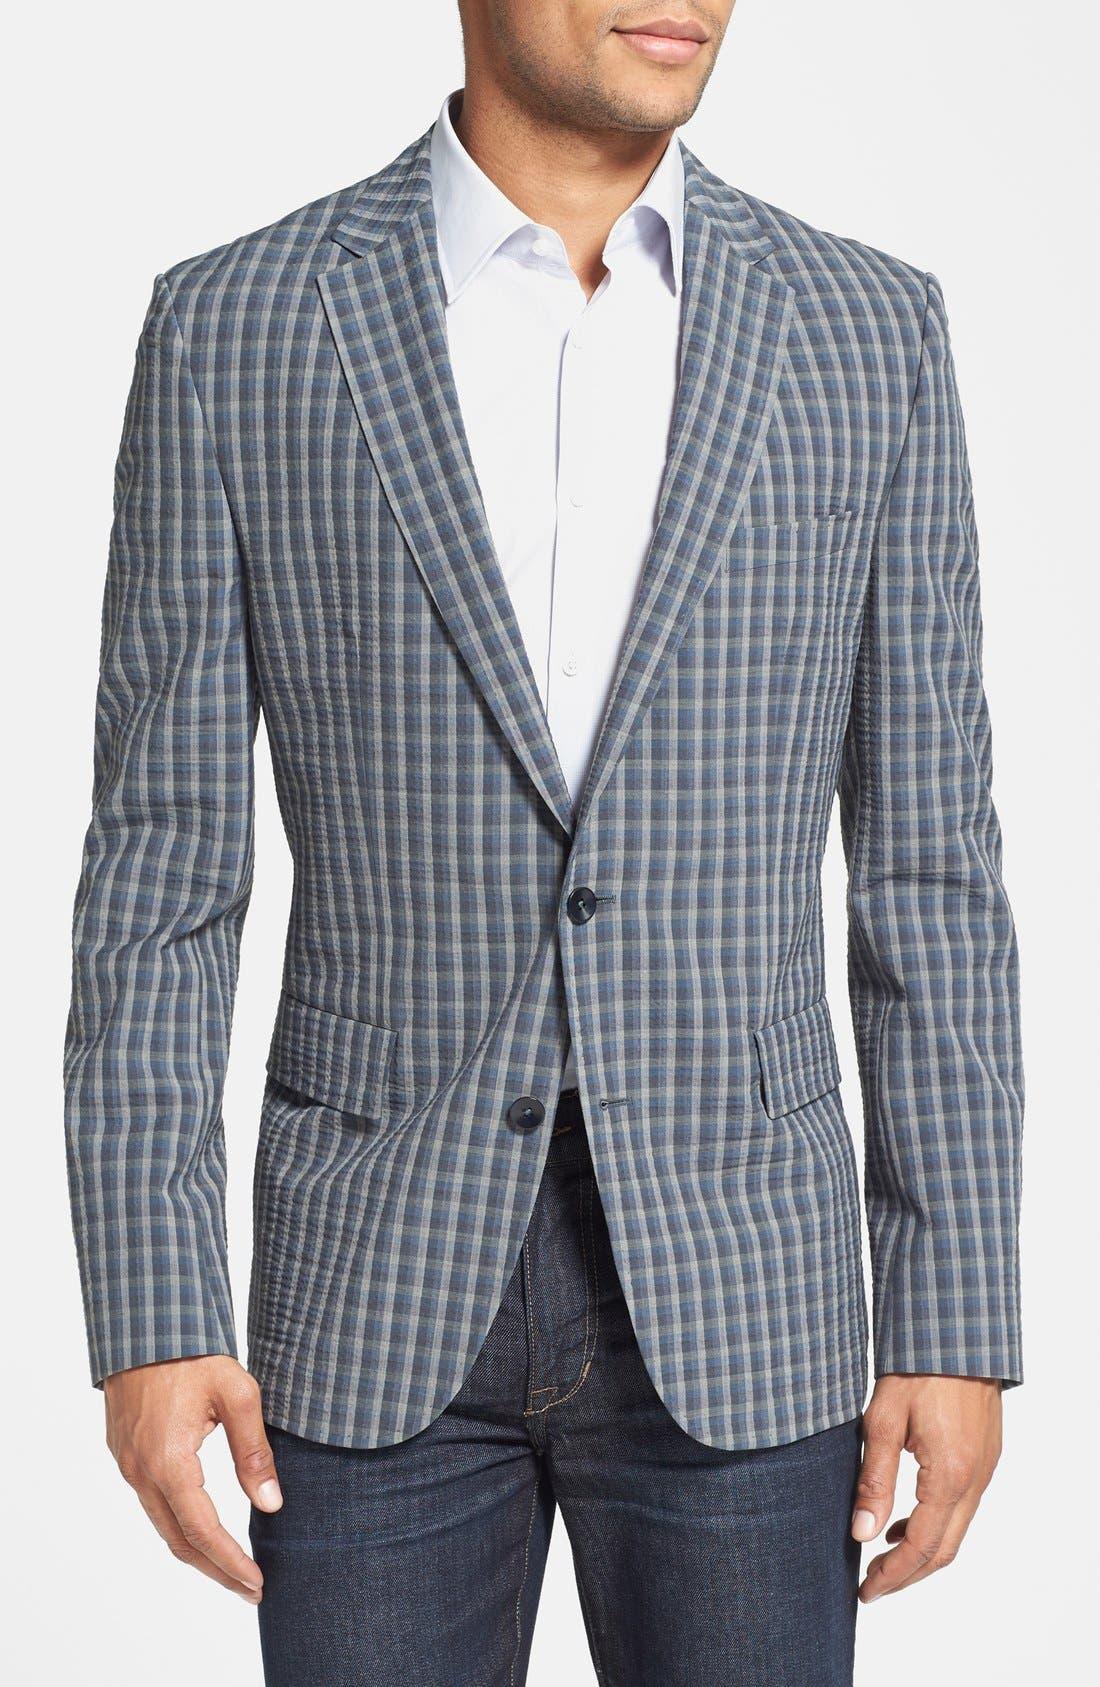 Alternate Image 1 Selected - BOSS HUGO BOSS 'Noris' Trim Fit Plaid Sport Coat